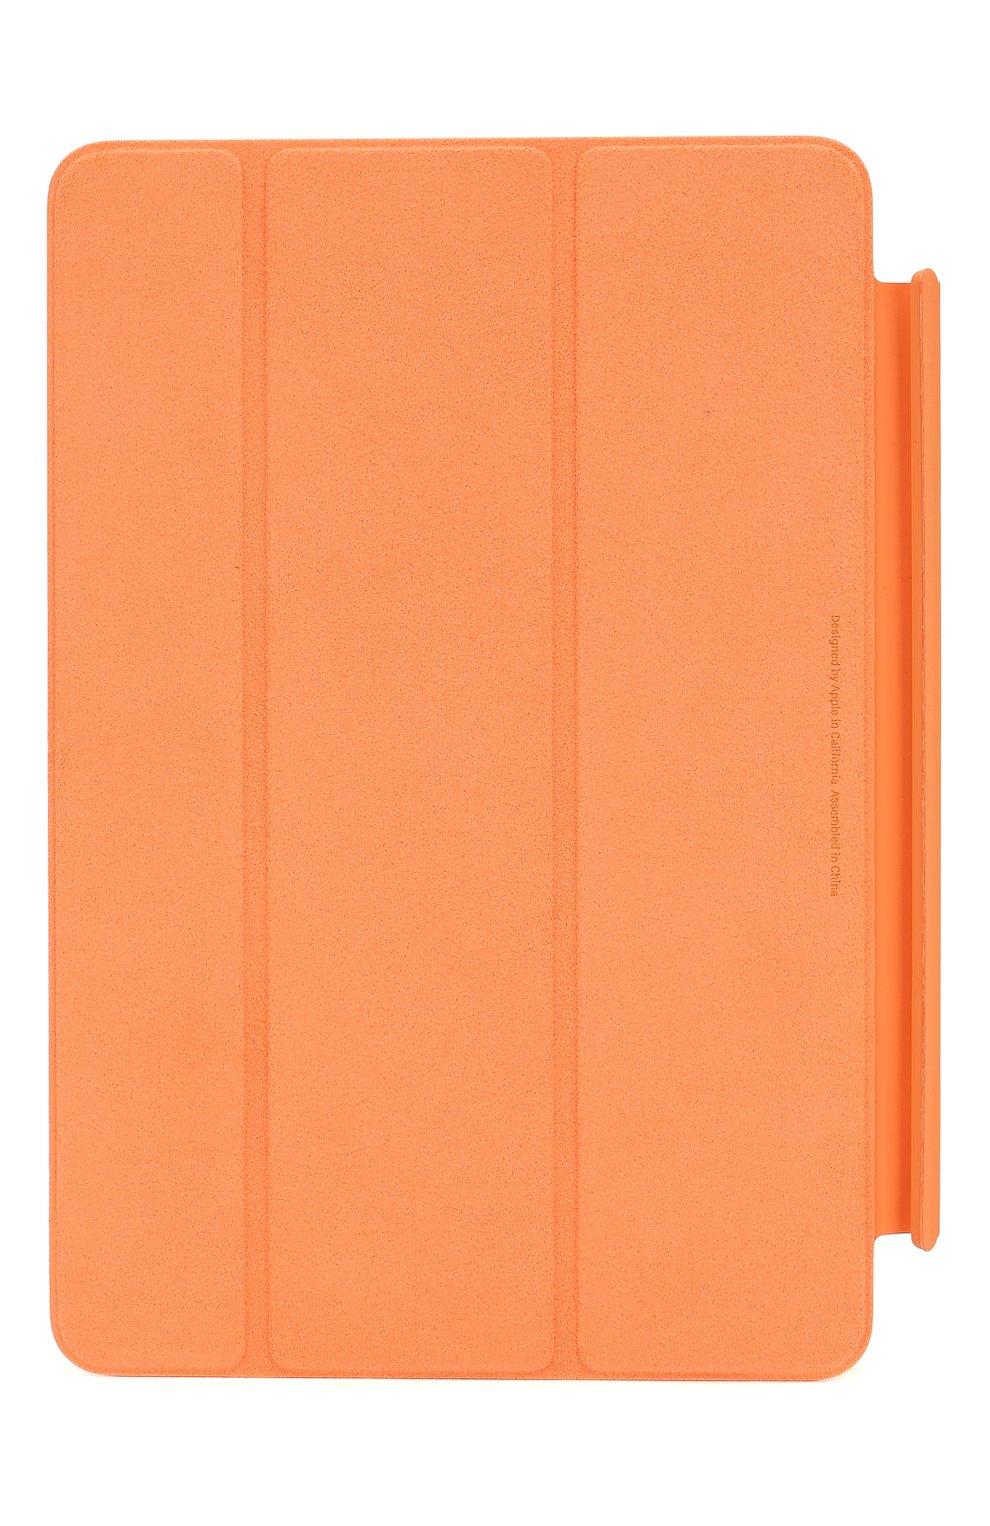 Чехол smart cover для ipad mini APPLE  оранжевого цвета, арт. MVQG2ZM/A   Фото 2